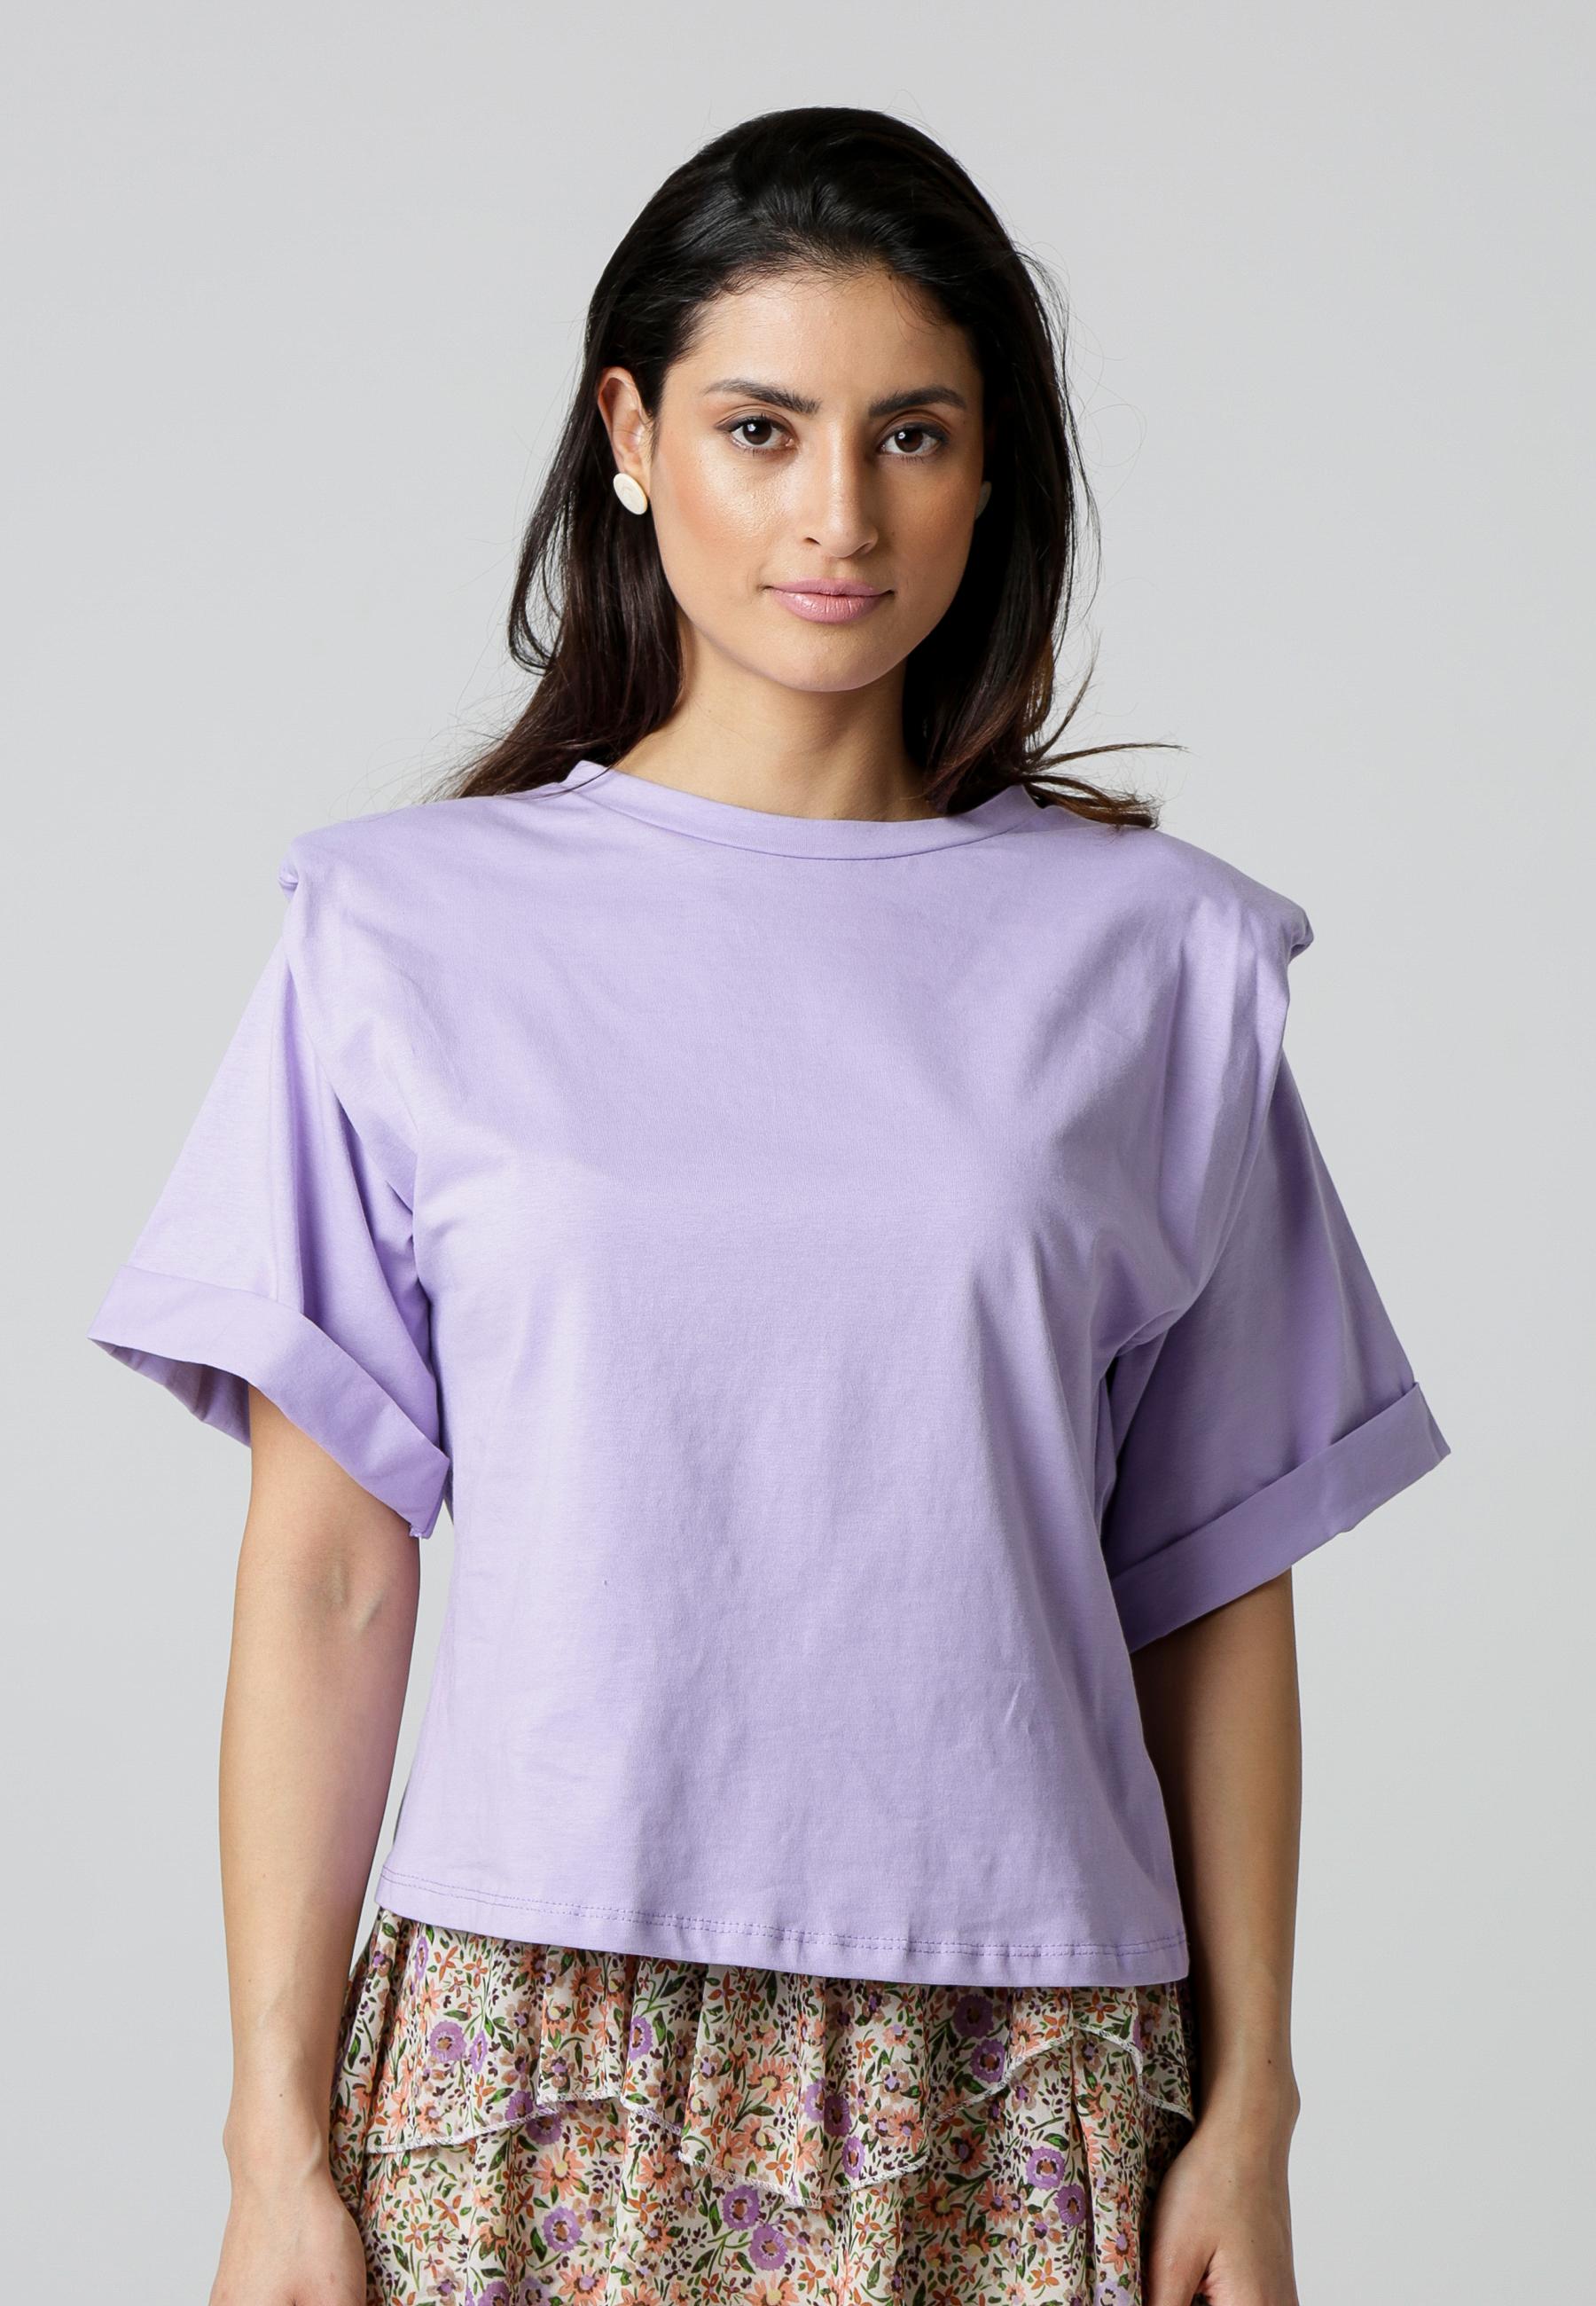 MiaZAYA Shirt 3/4 Arm